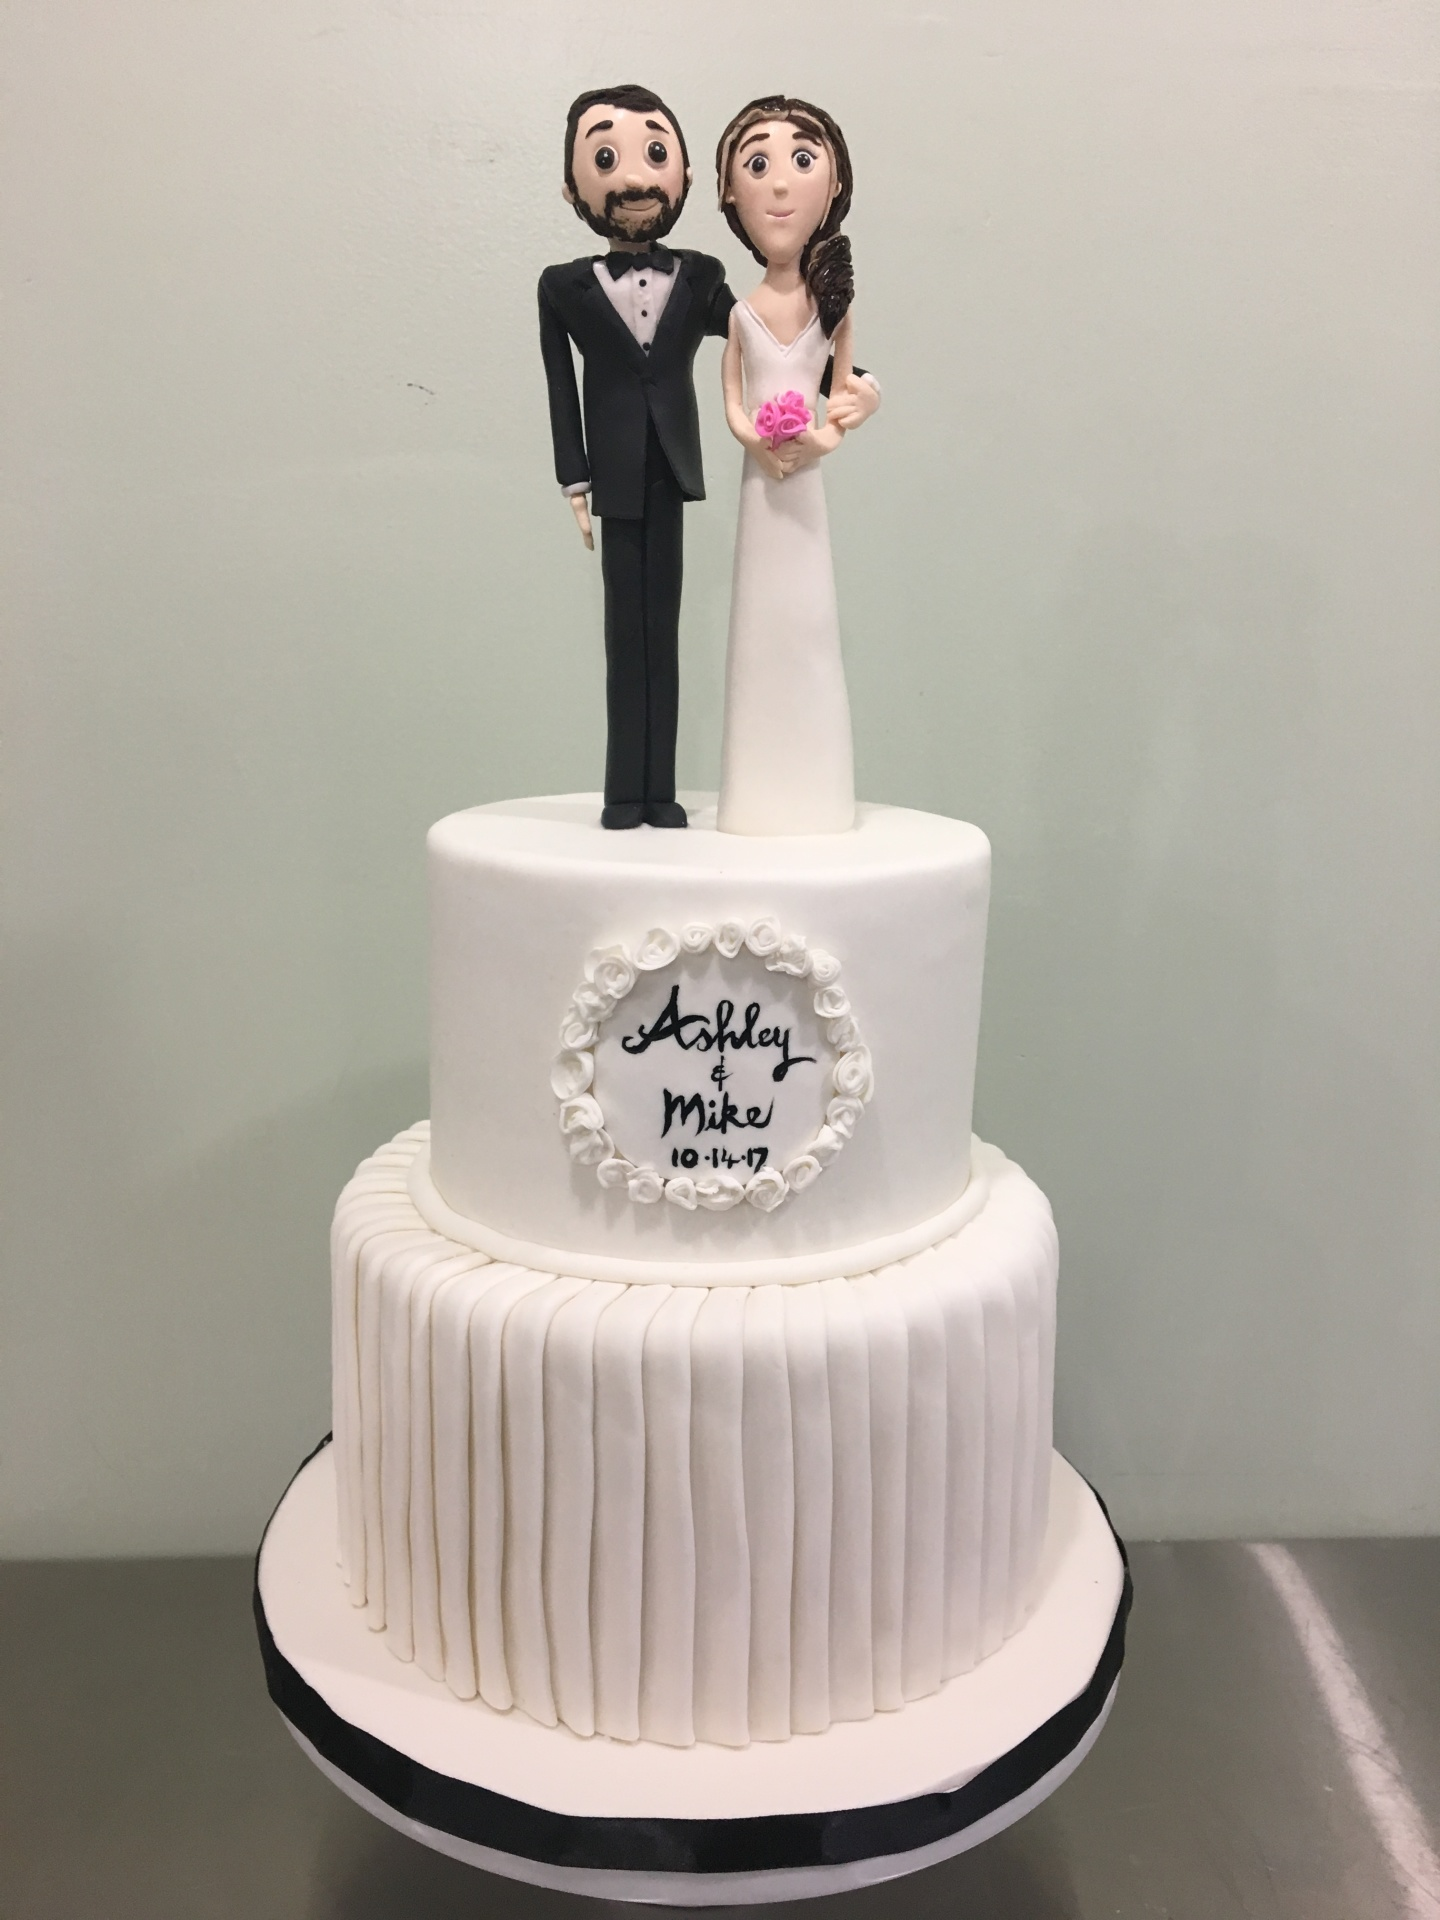 wedding Cake NJ fondant bride and groom figurines